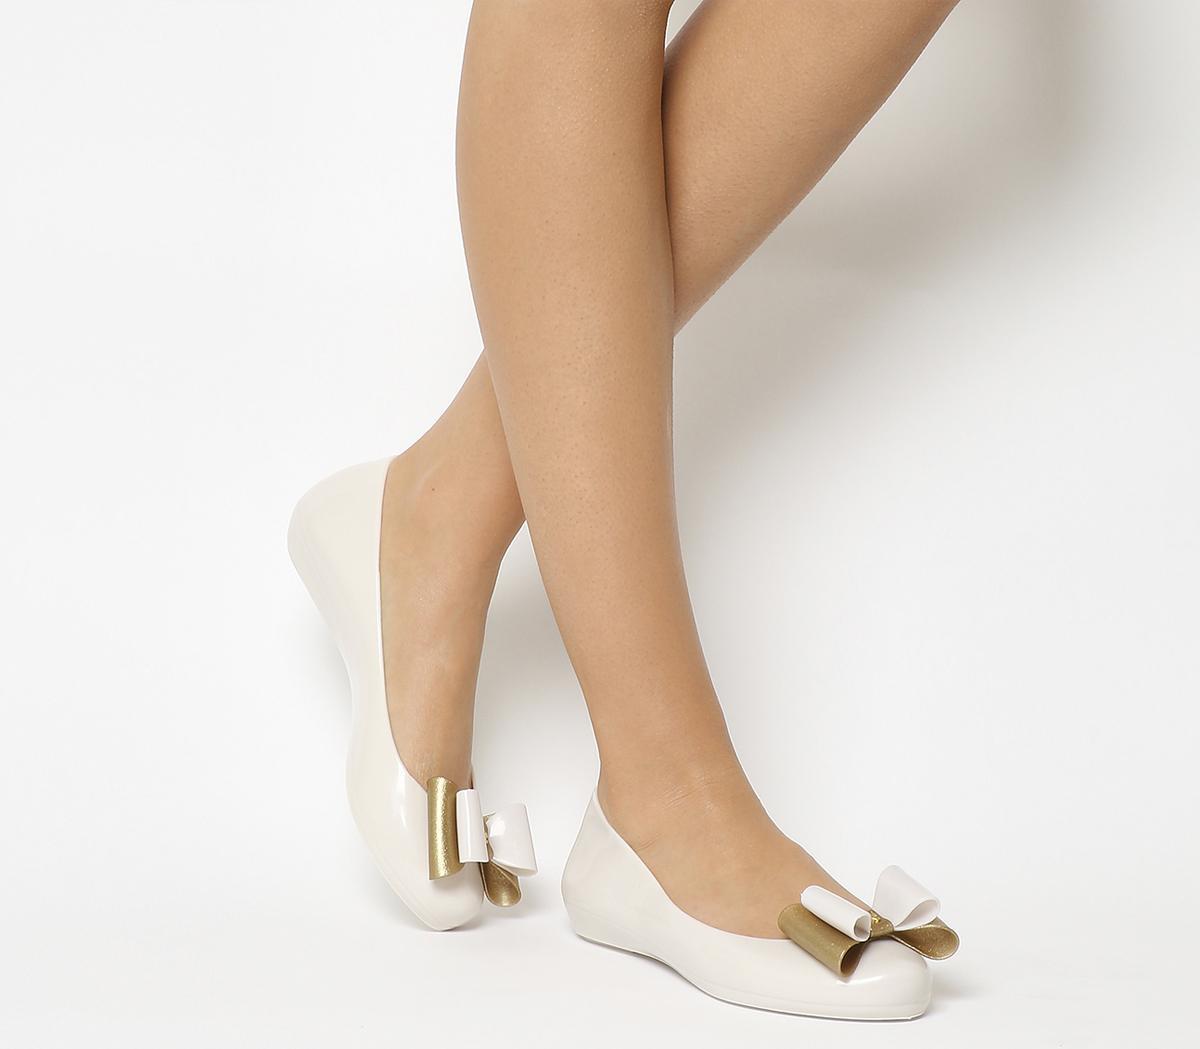 Zaxy Pop Bow 3 Pumps Ivory Glitter - Flats